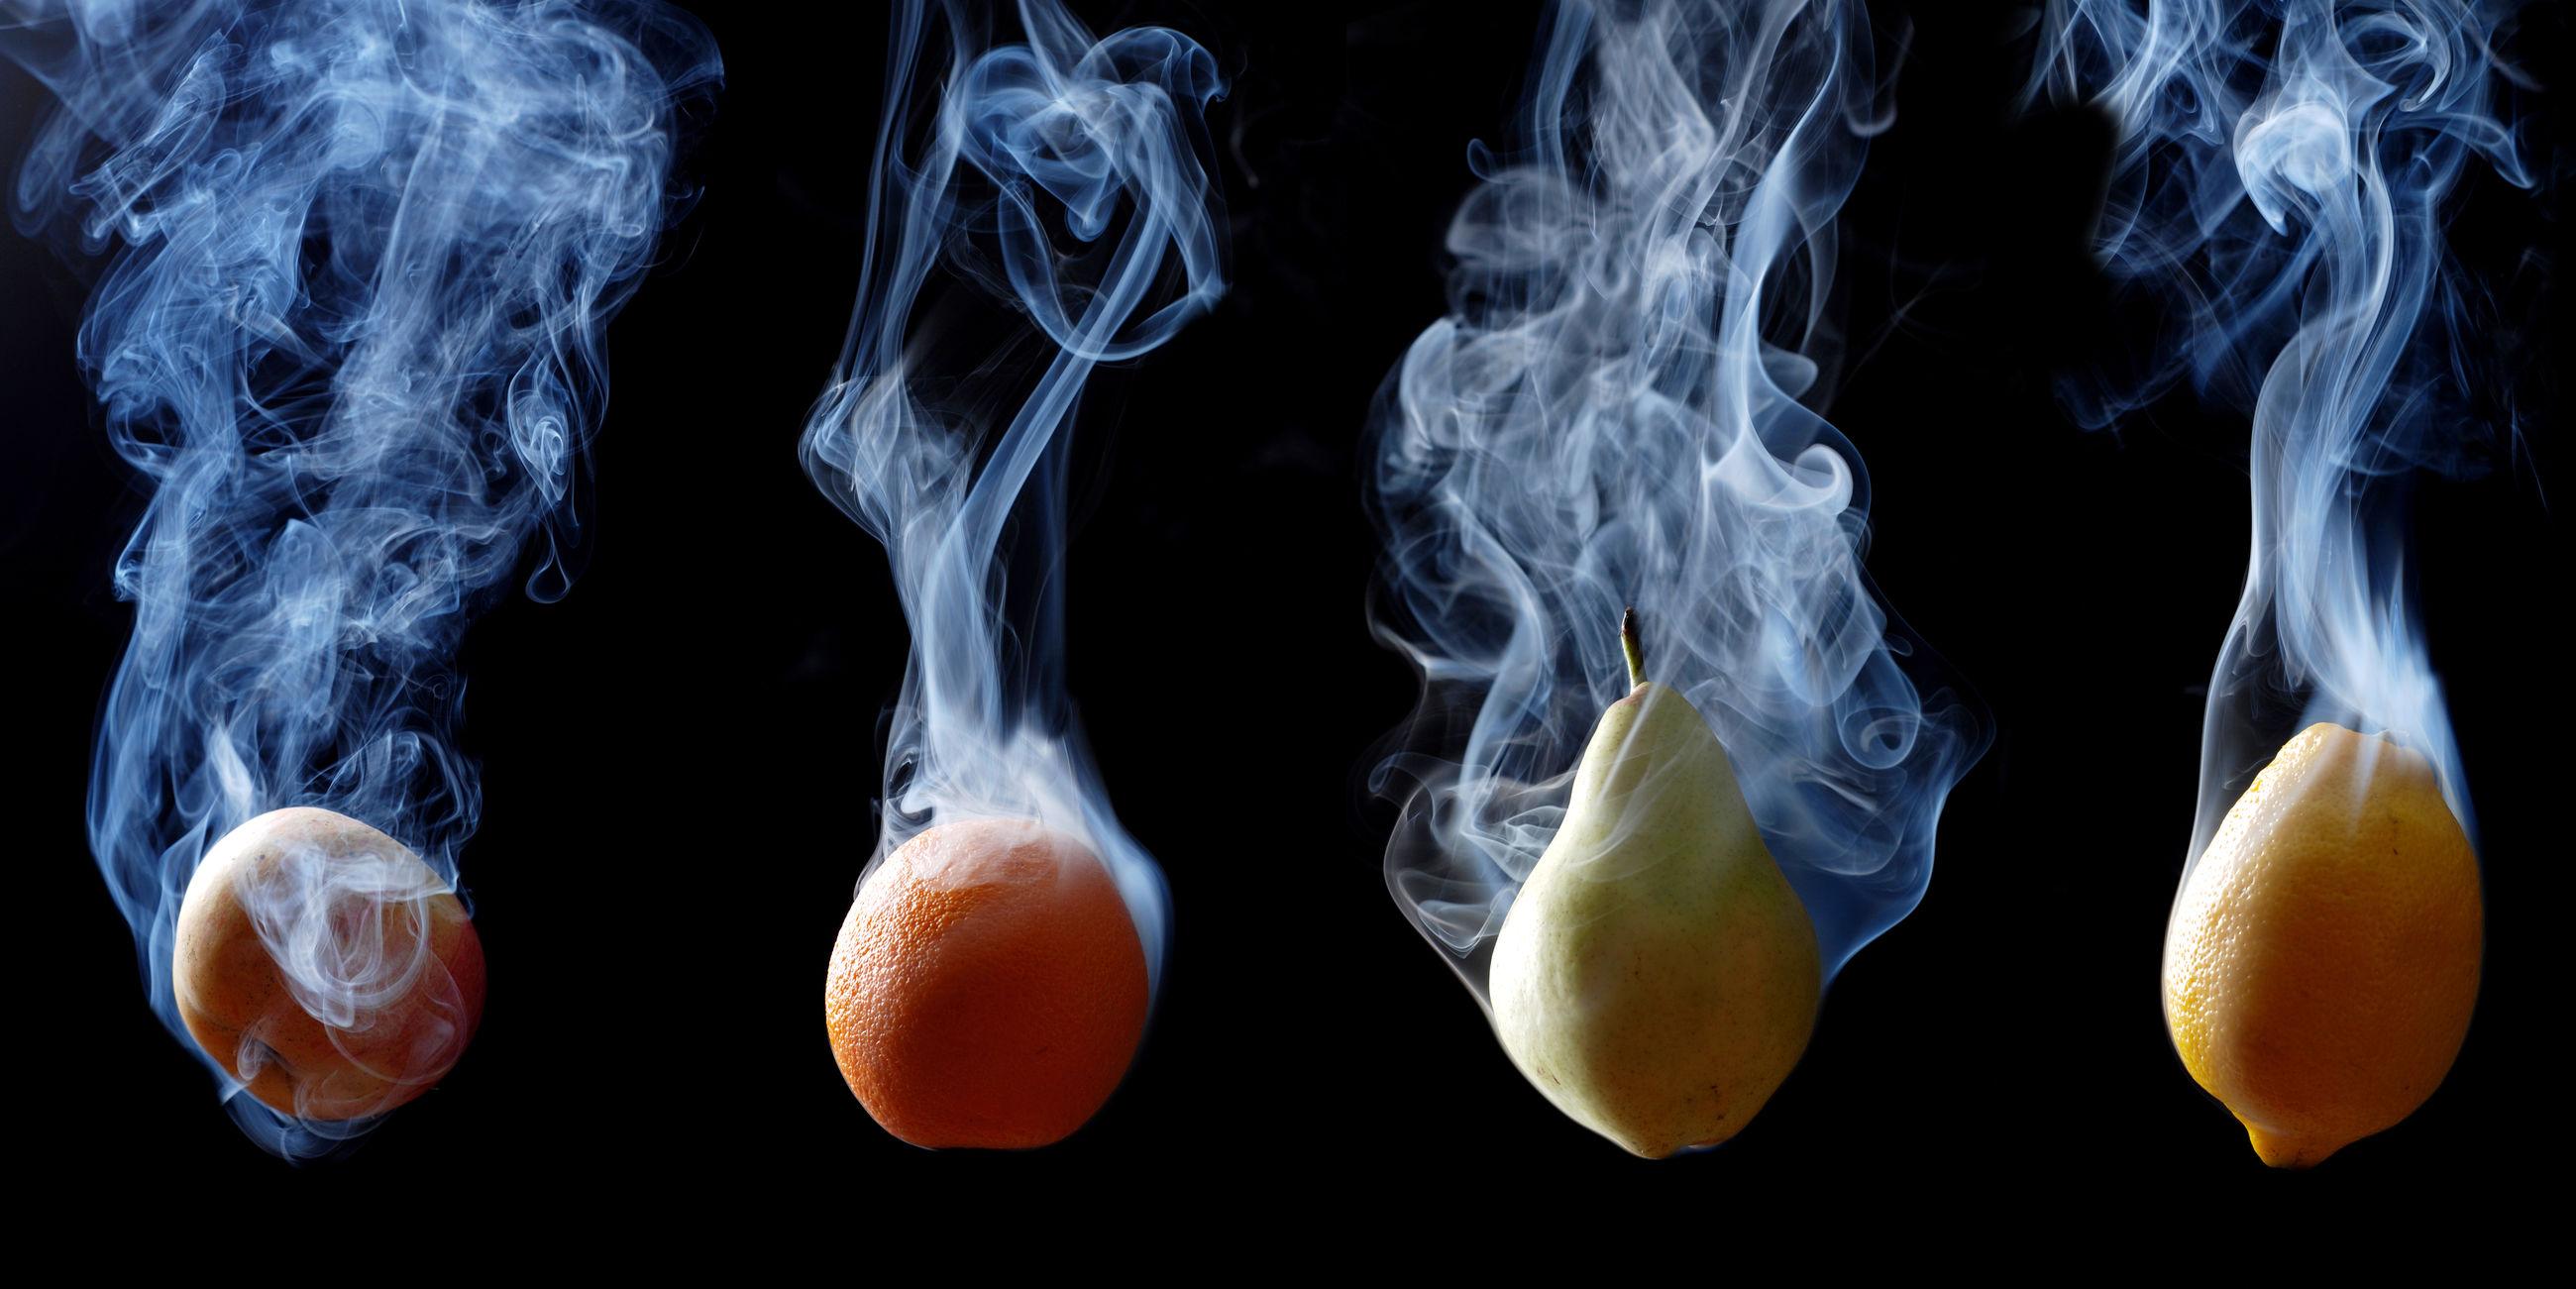 Fruits smoking against black background